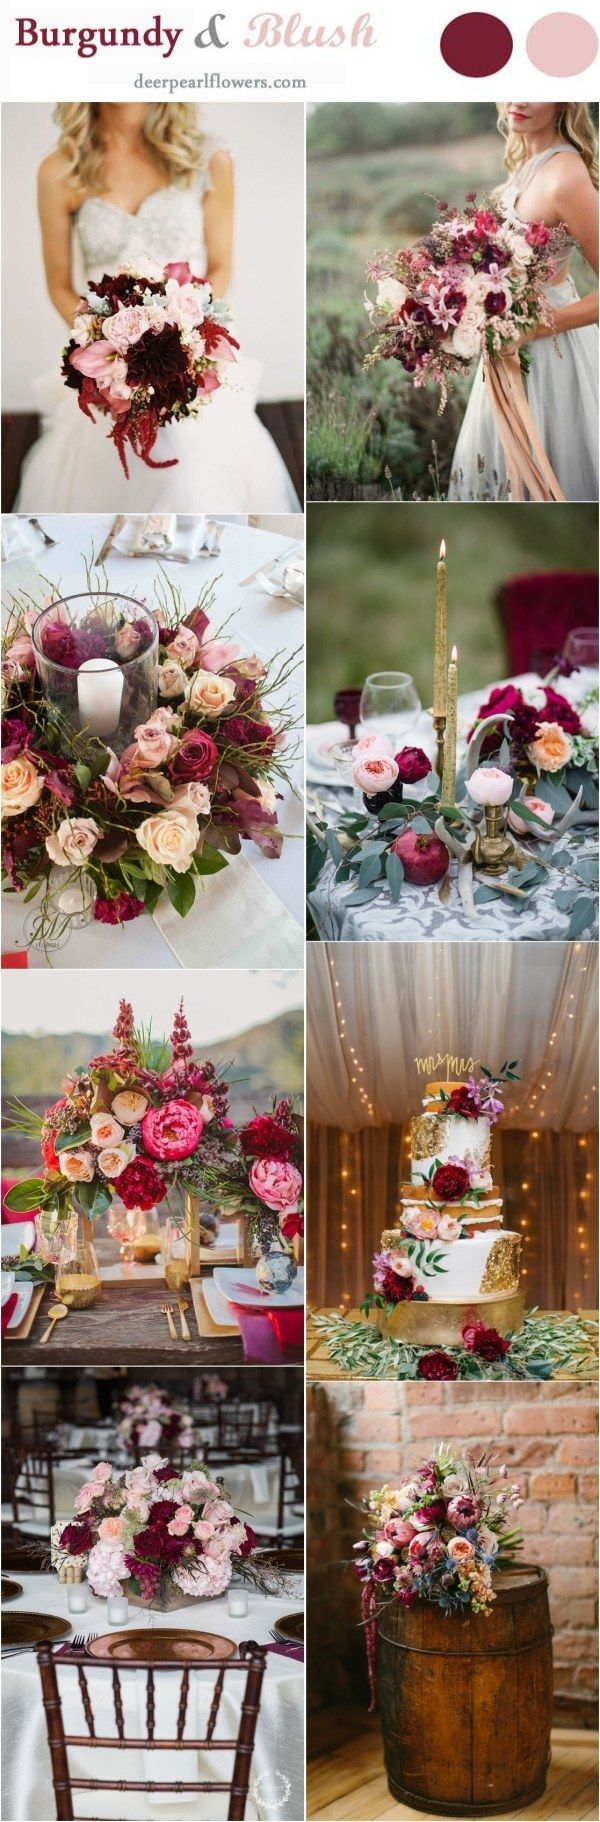 best wedding ideas images on pinterest wedding ideas